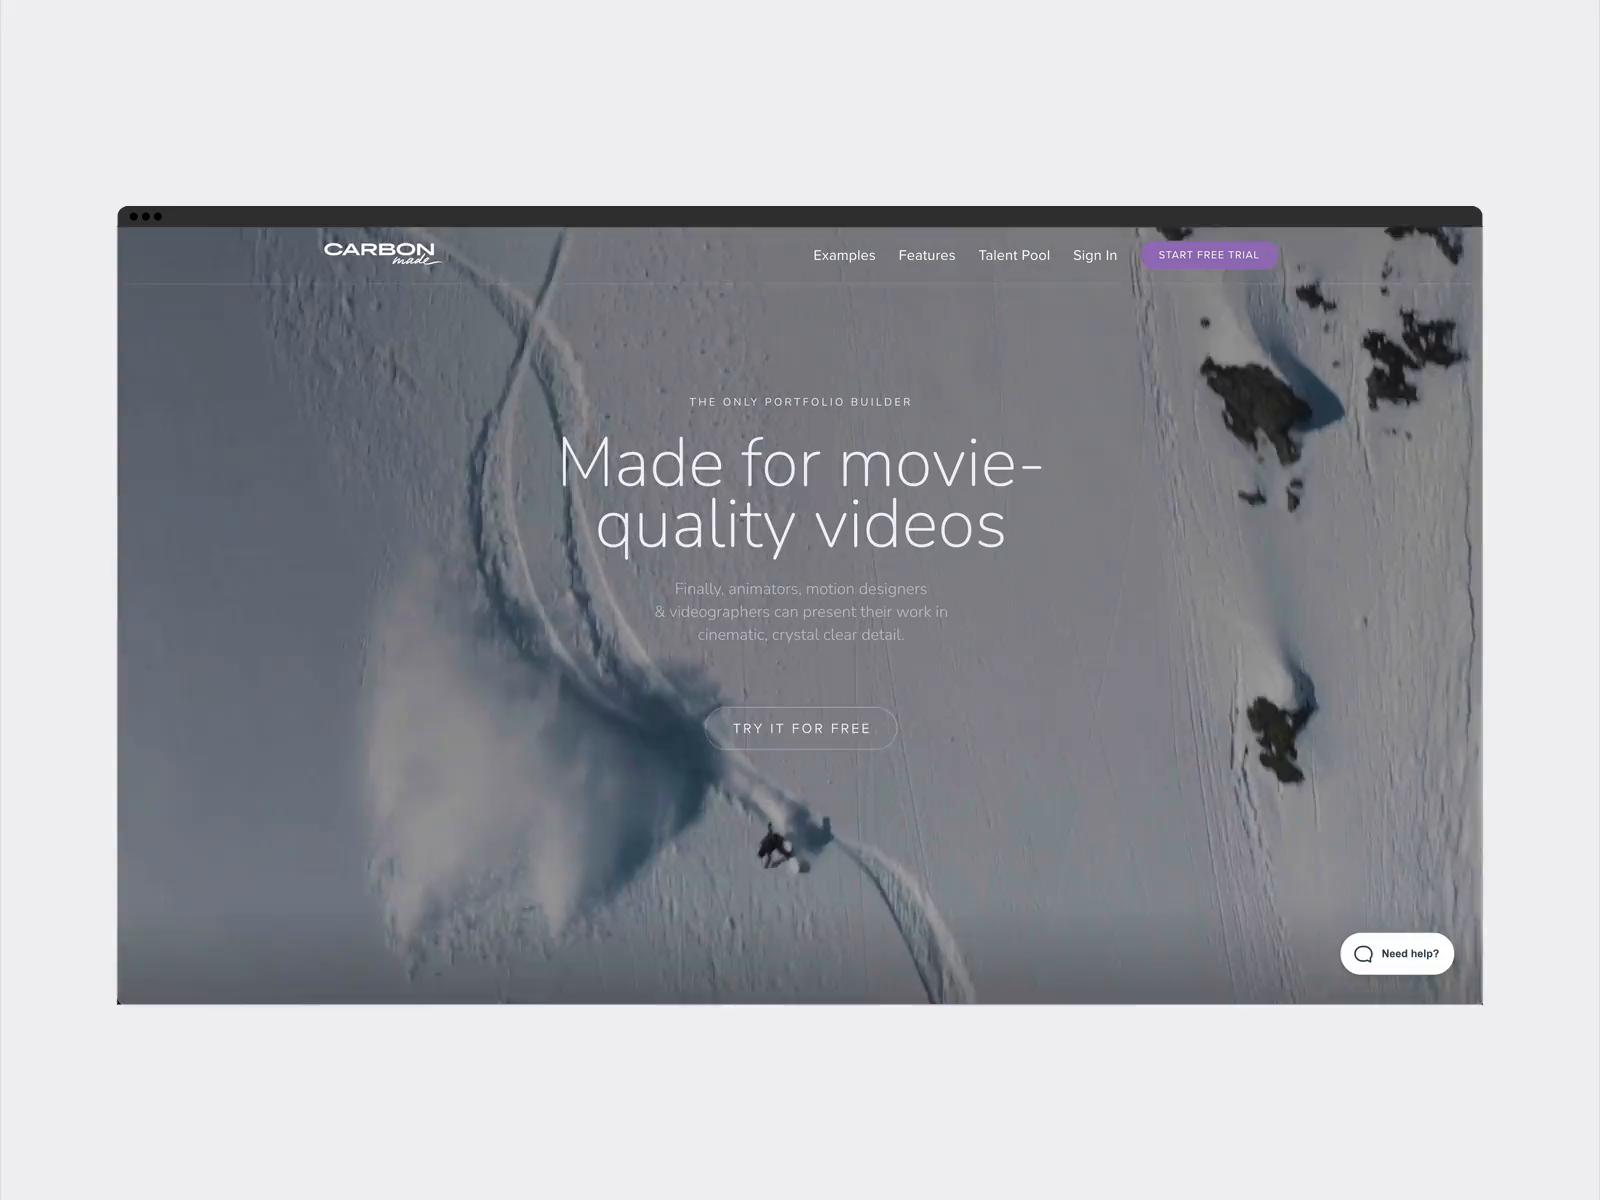 4K Video ready for your portfolio ✨